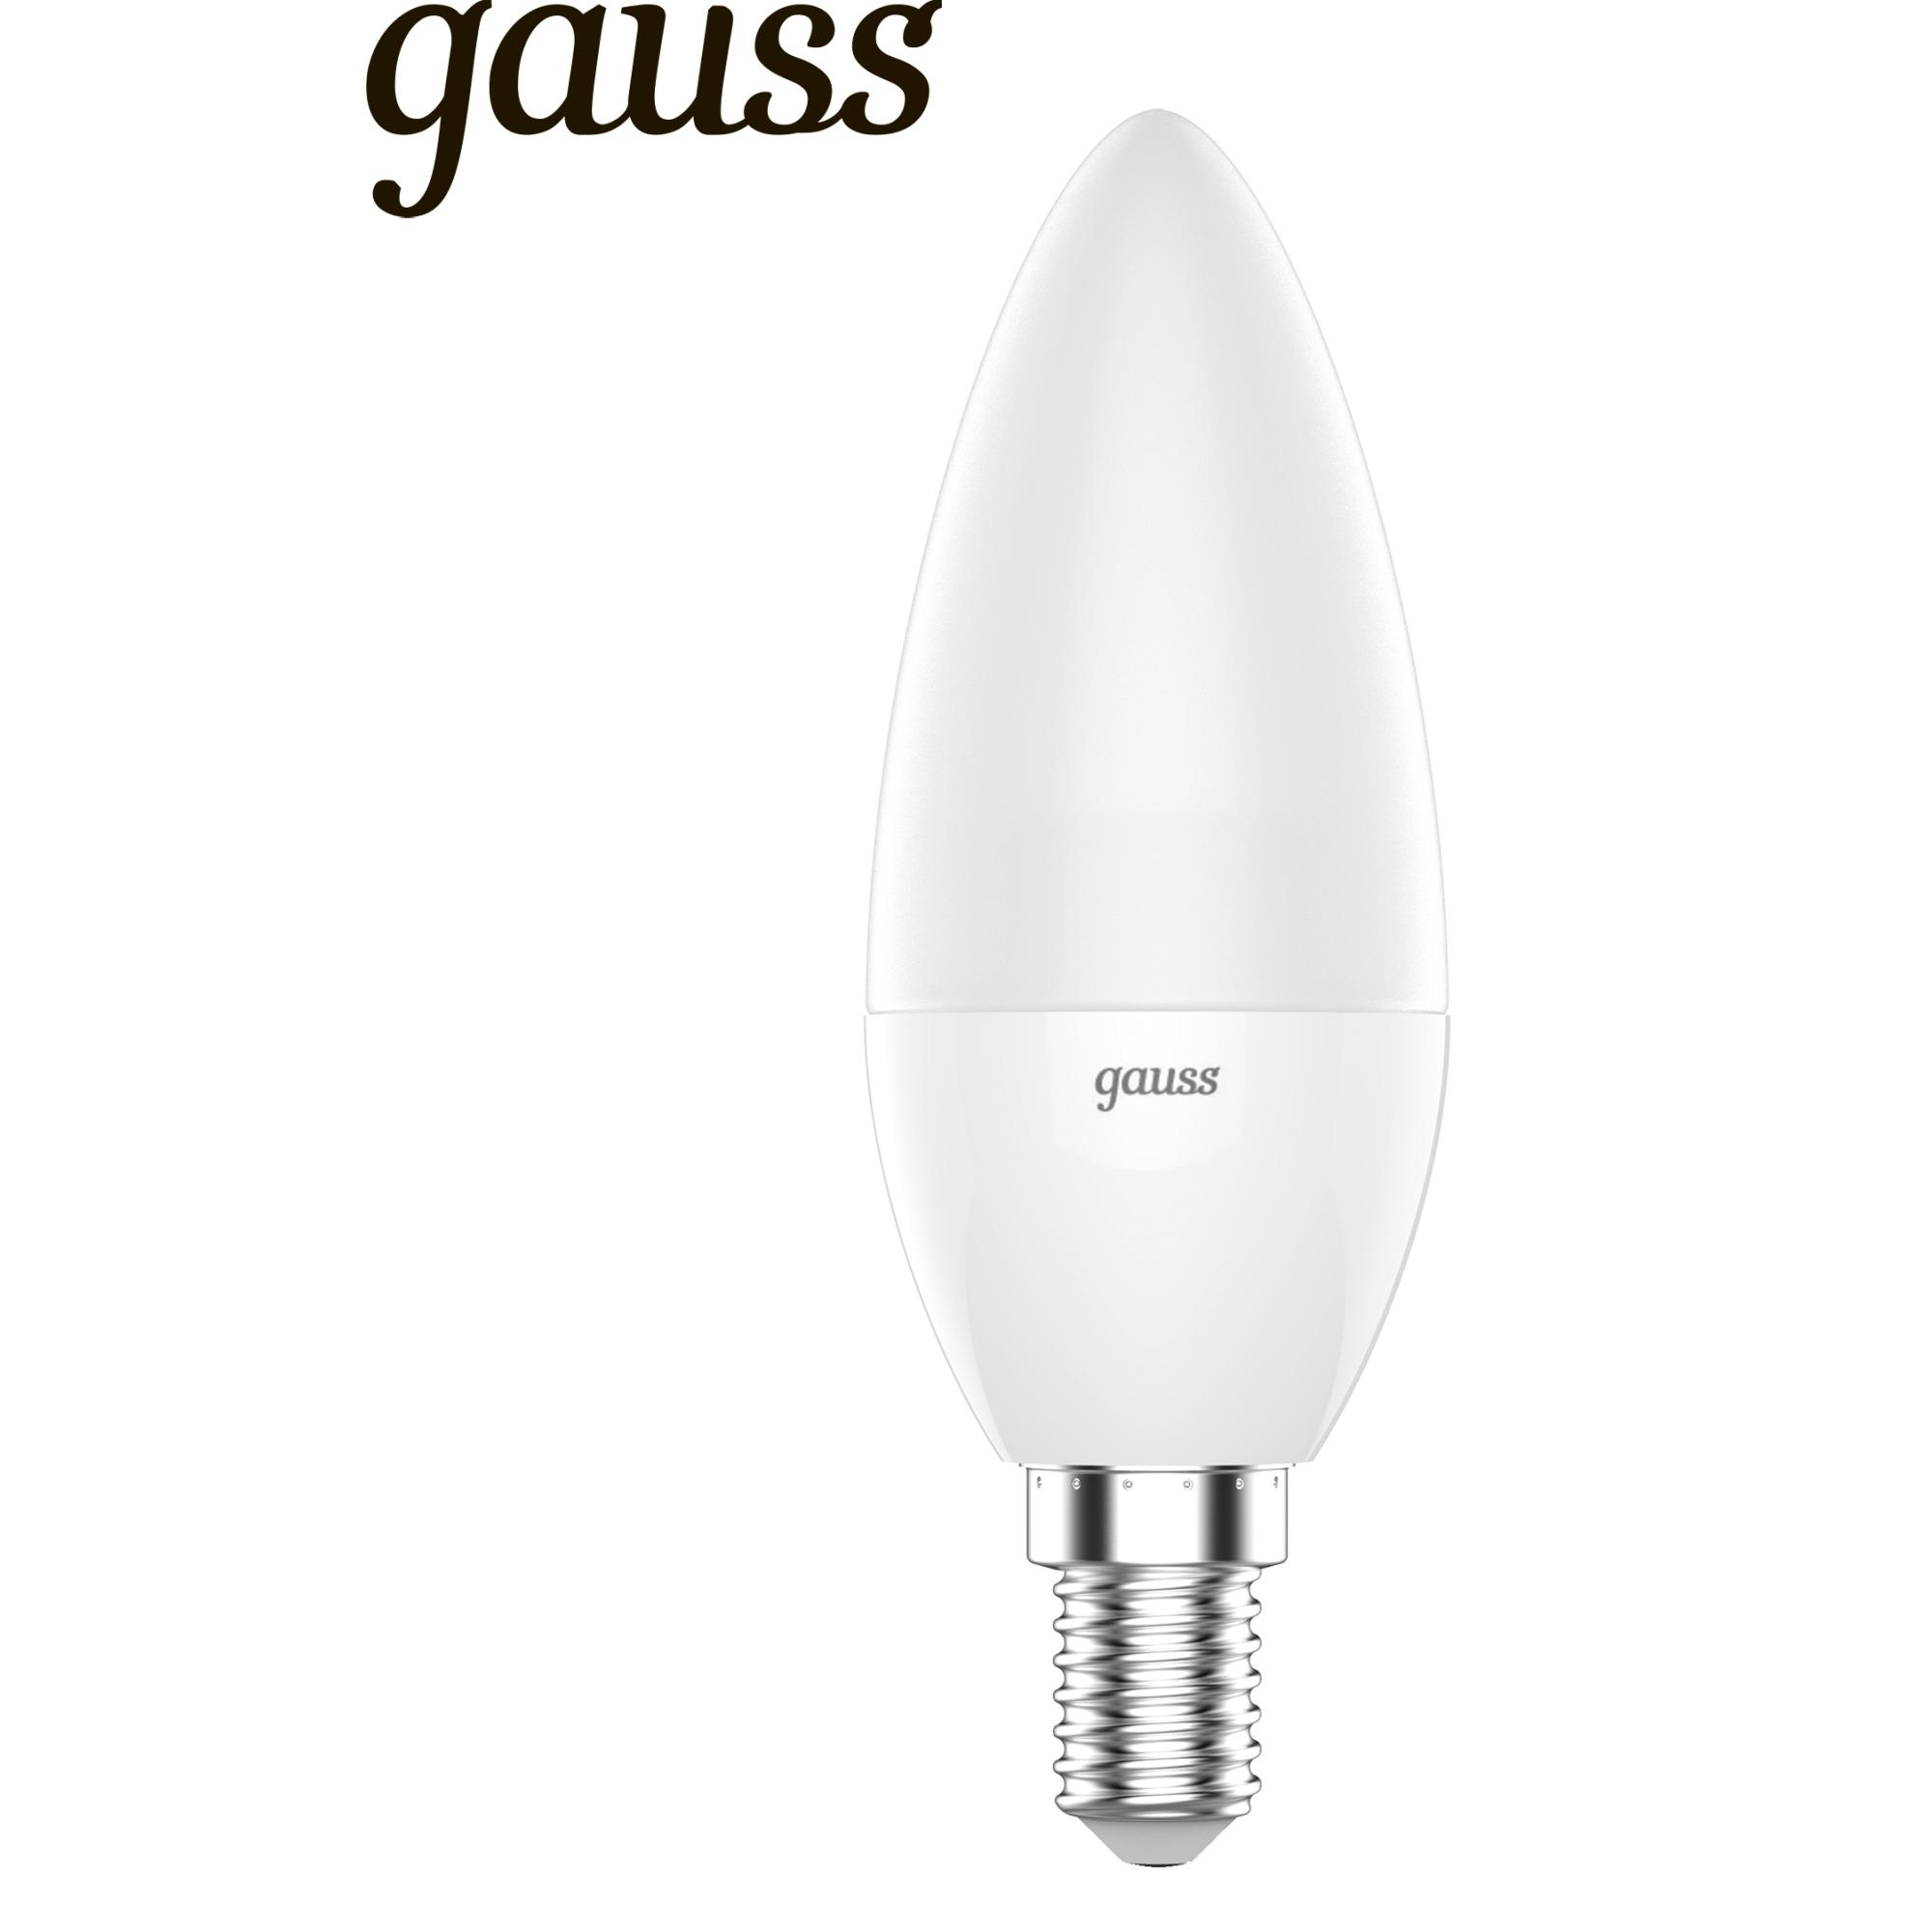 Набор светодиодных ламп (3 шт.) E14 5.5 Вт свеча матовая тёплый белый свет